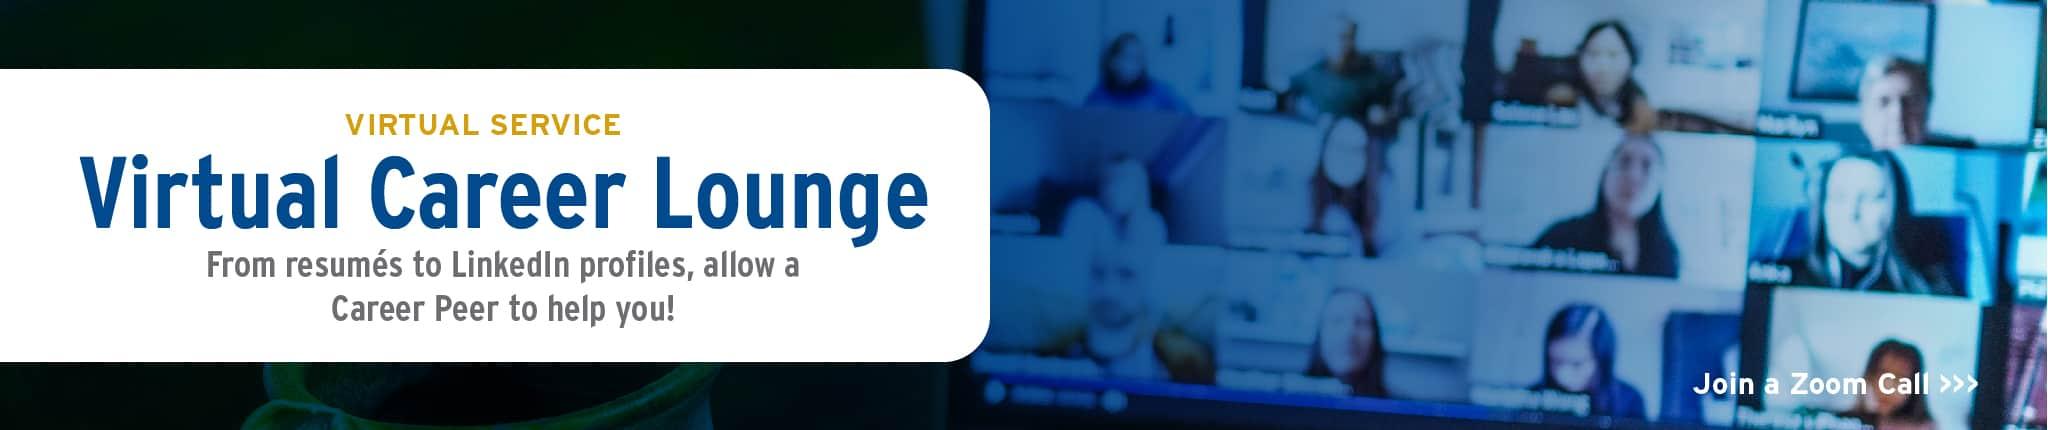 Virtual Career Lounge